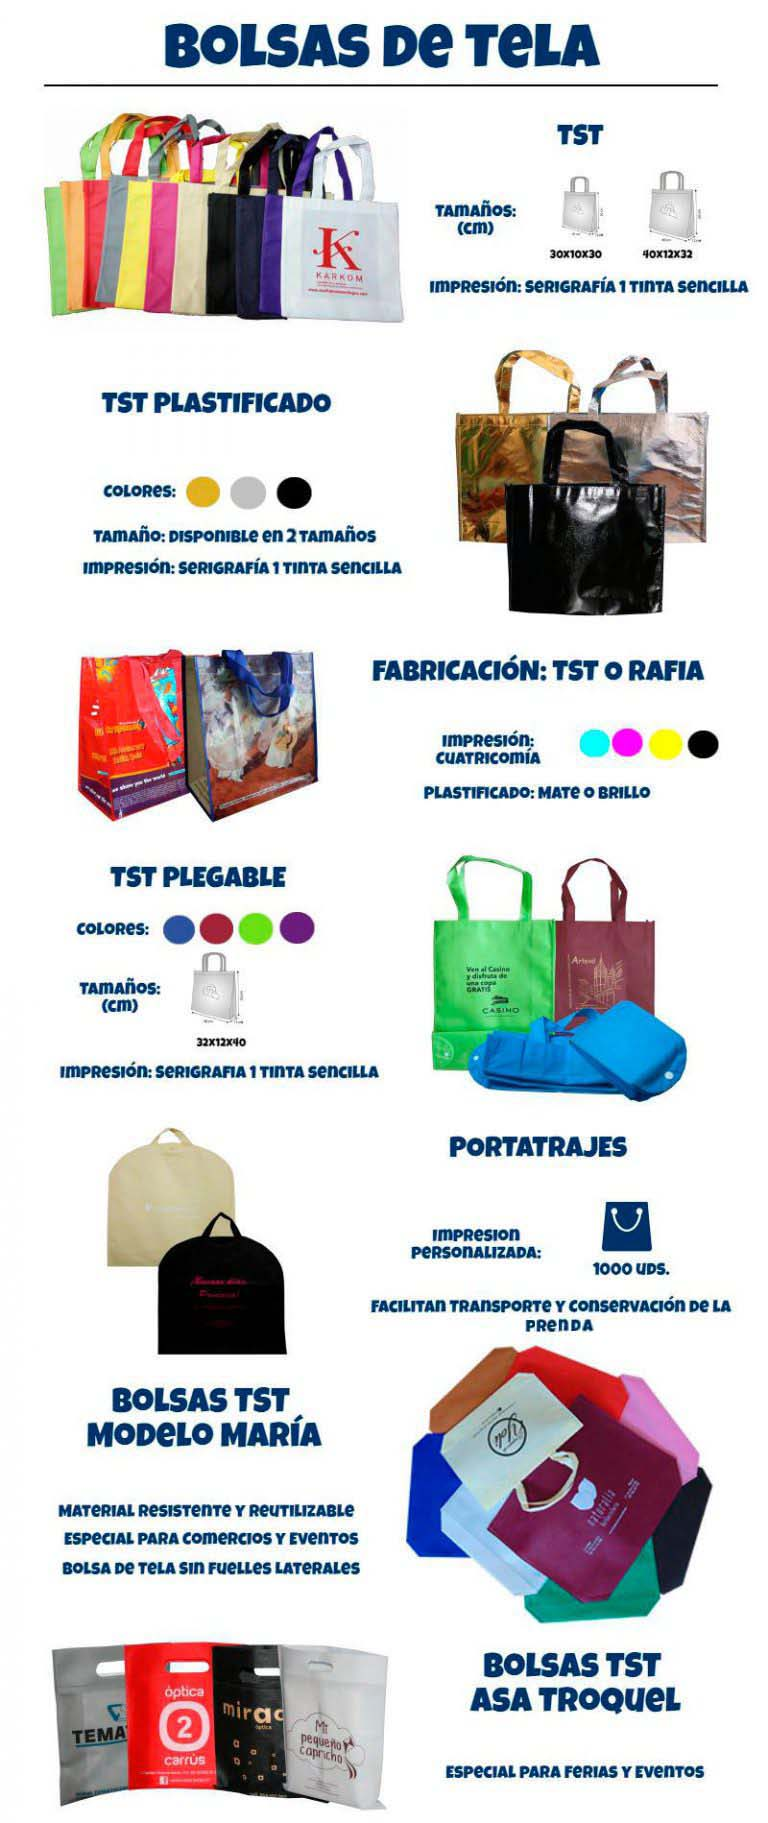 70a856cb1 Bolsas de Tela Personalizadas con Servicio Urgente - Bolsapubli.net